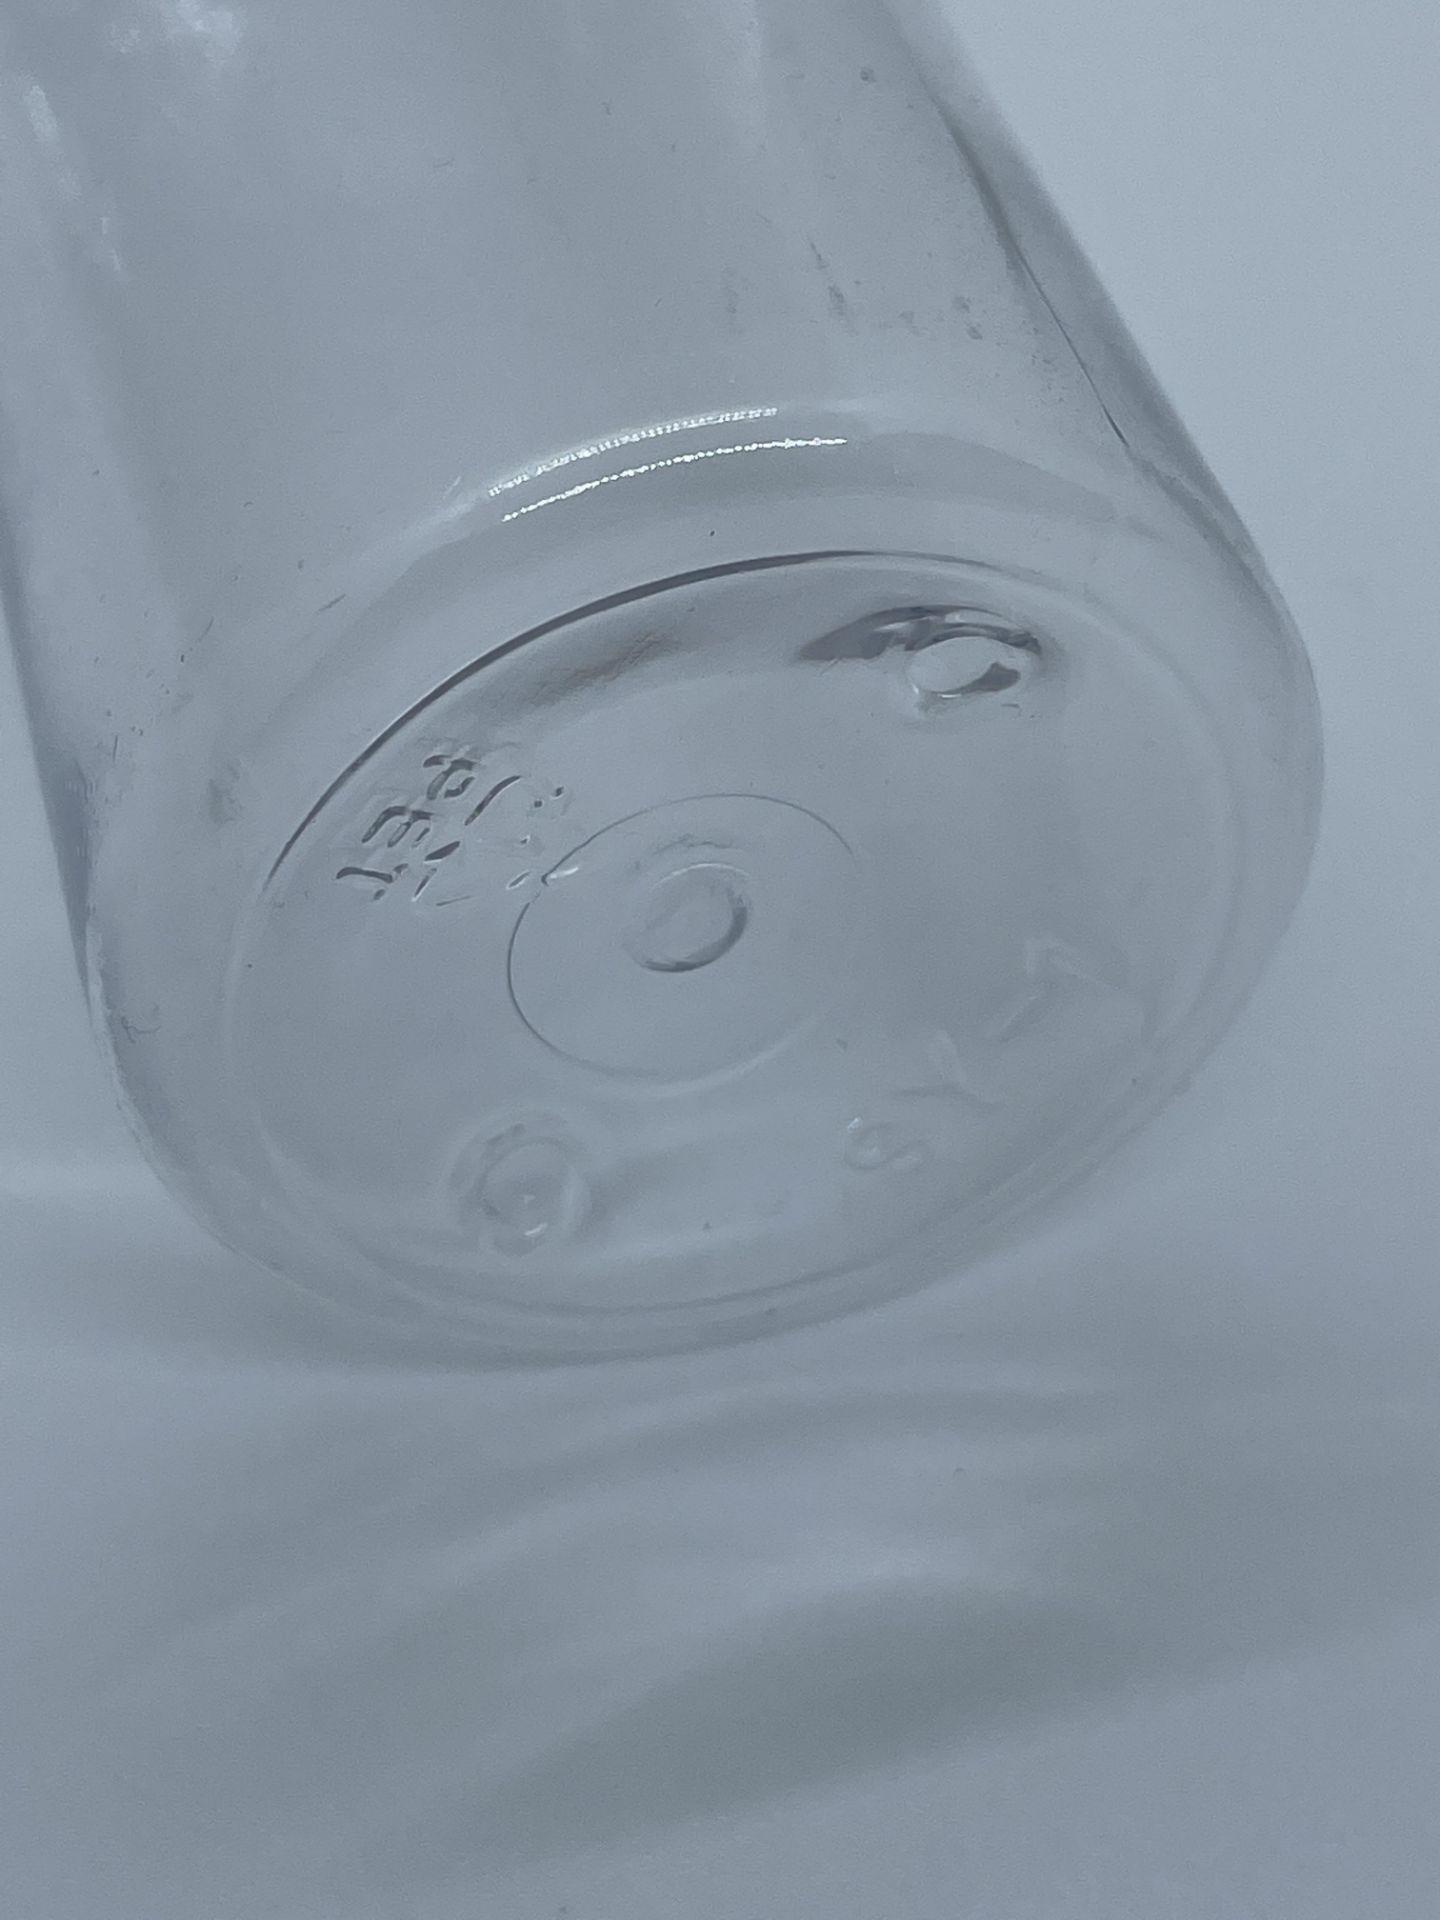 "75,000 - Clear Plastic Bullet 8 oz Empty Bottles, 24-410 Threading Neck, 6.25"" Tall, 2"" Diameter - Image 5 of 5"